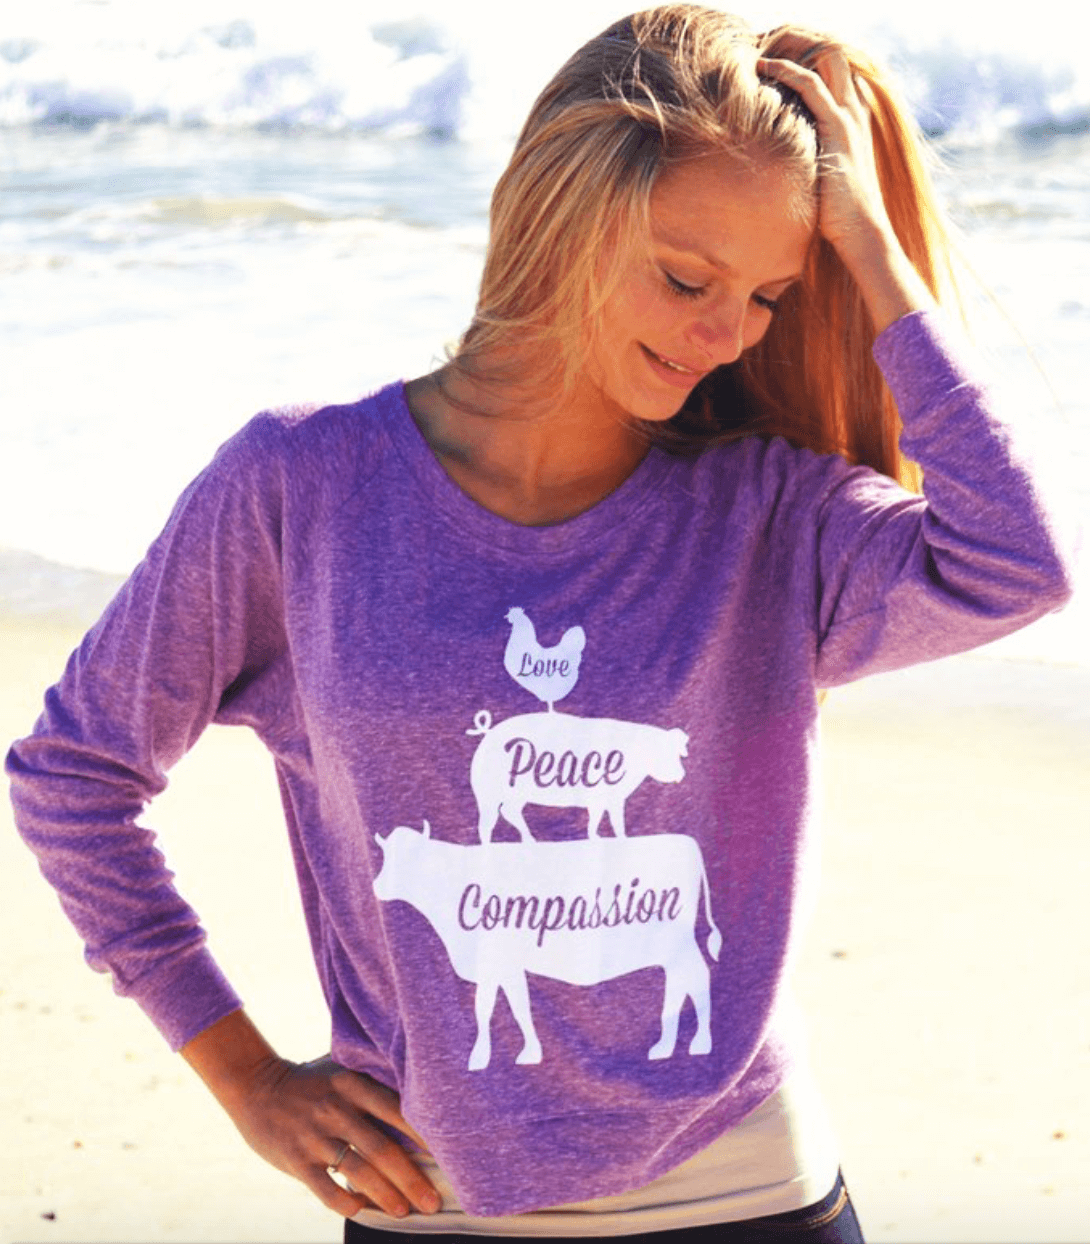 Love, Peace, Compassion Vegan sweatshirt